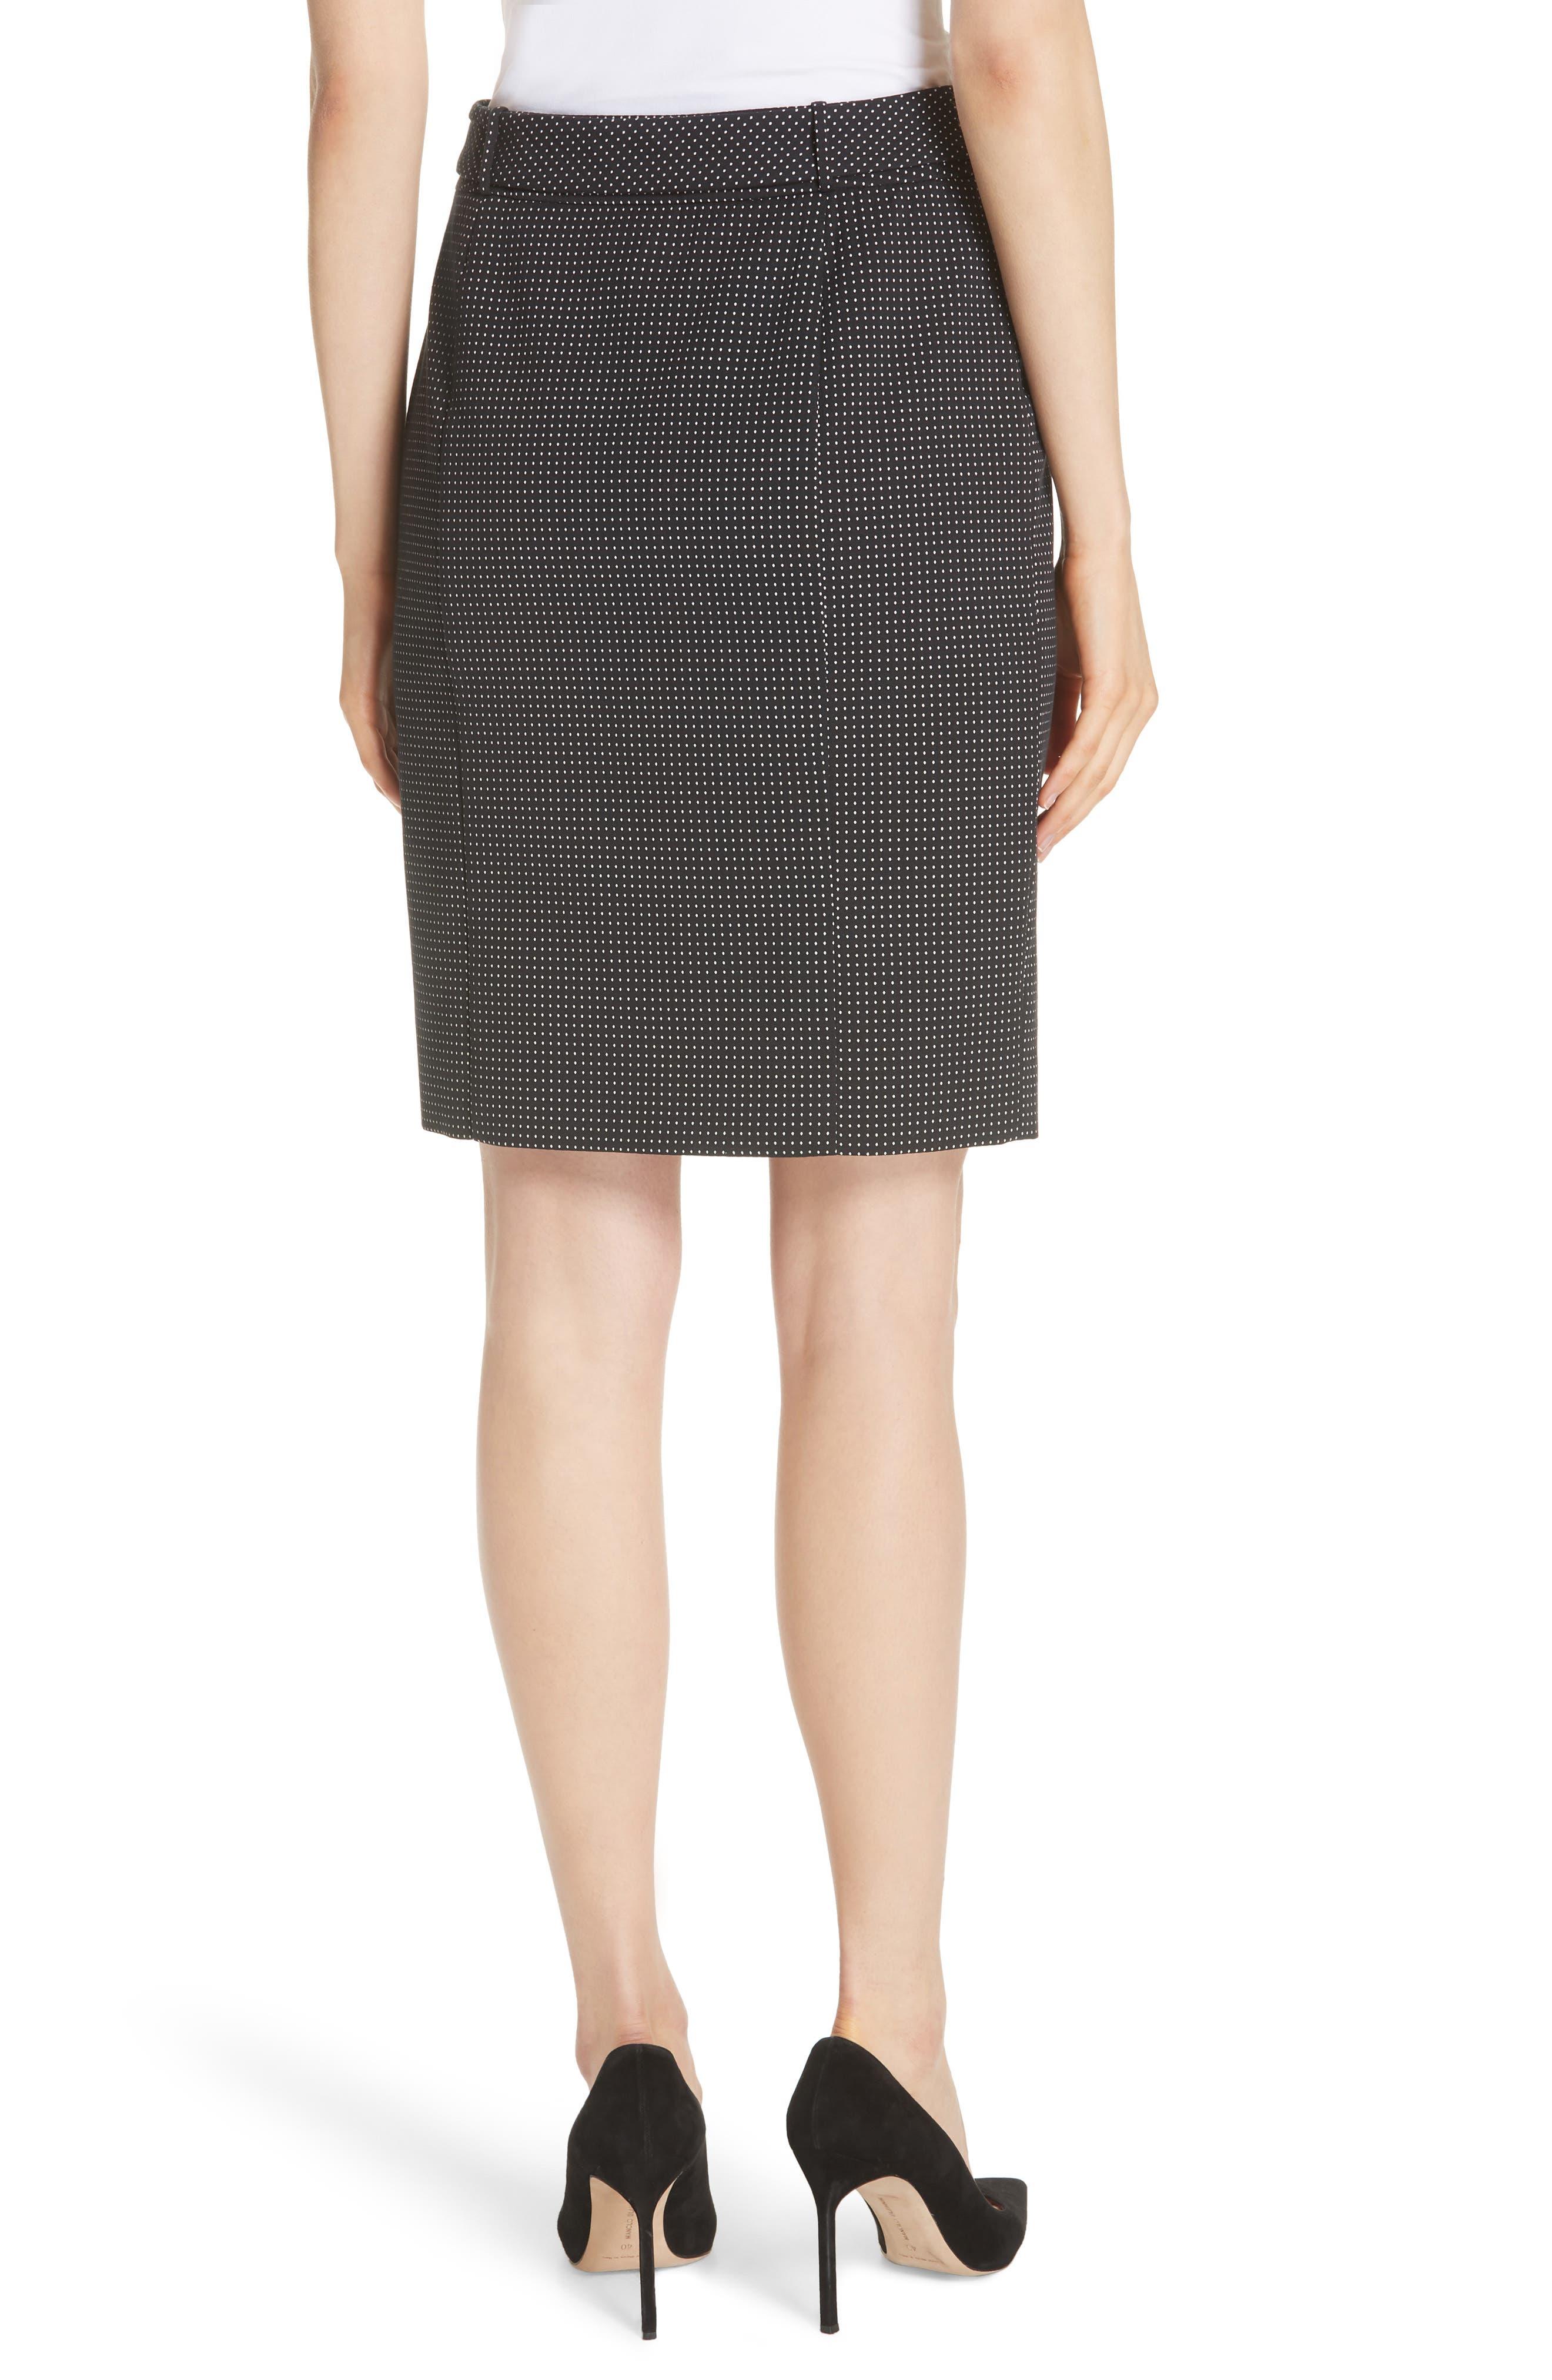 Vumano Dot Dessin Stretch Suit Skirt,                             Alternate thumbnail 2, color,                             BLACK FANTASY